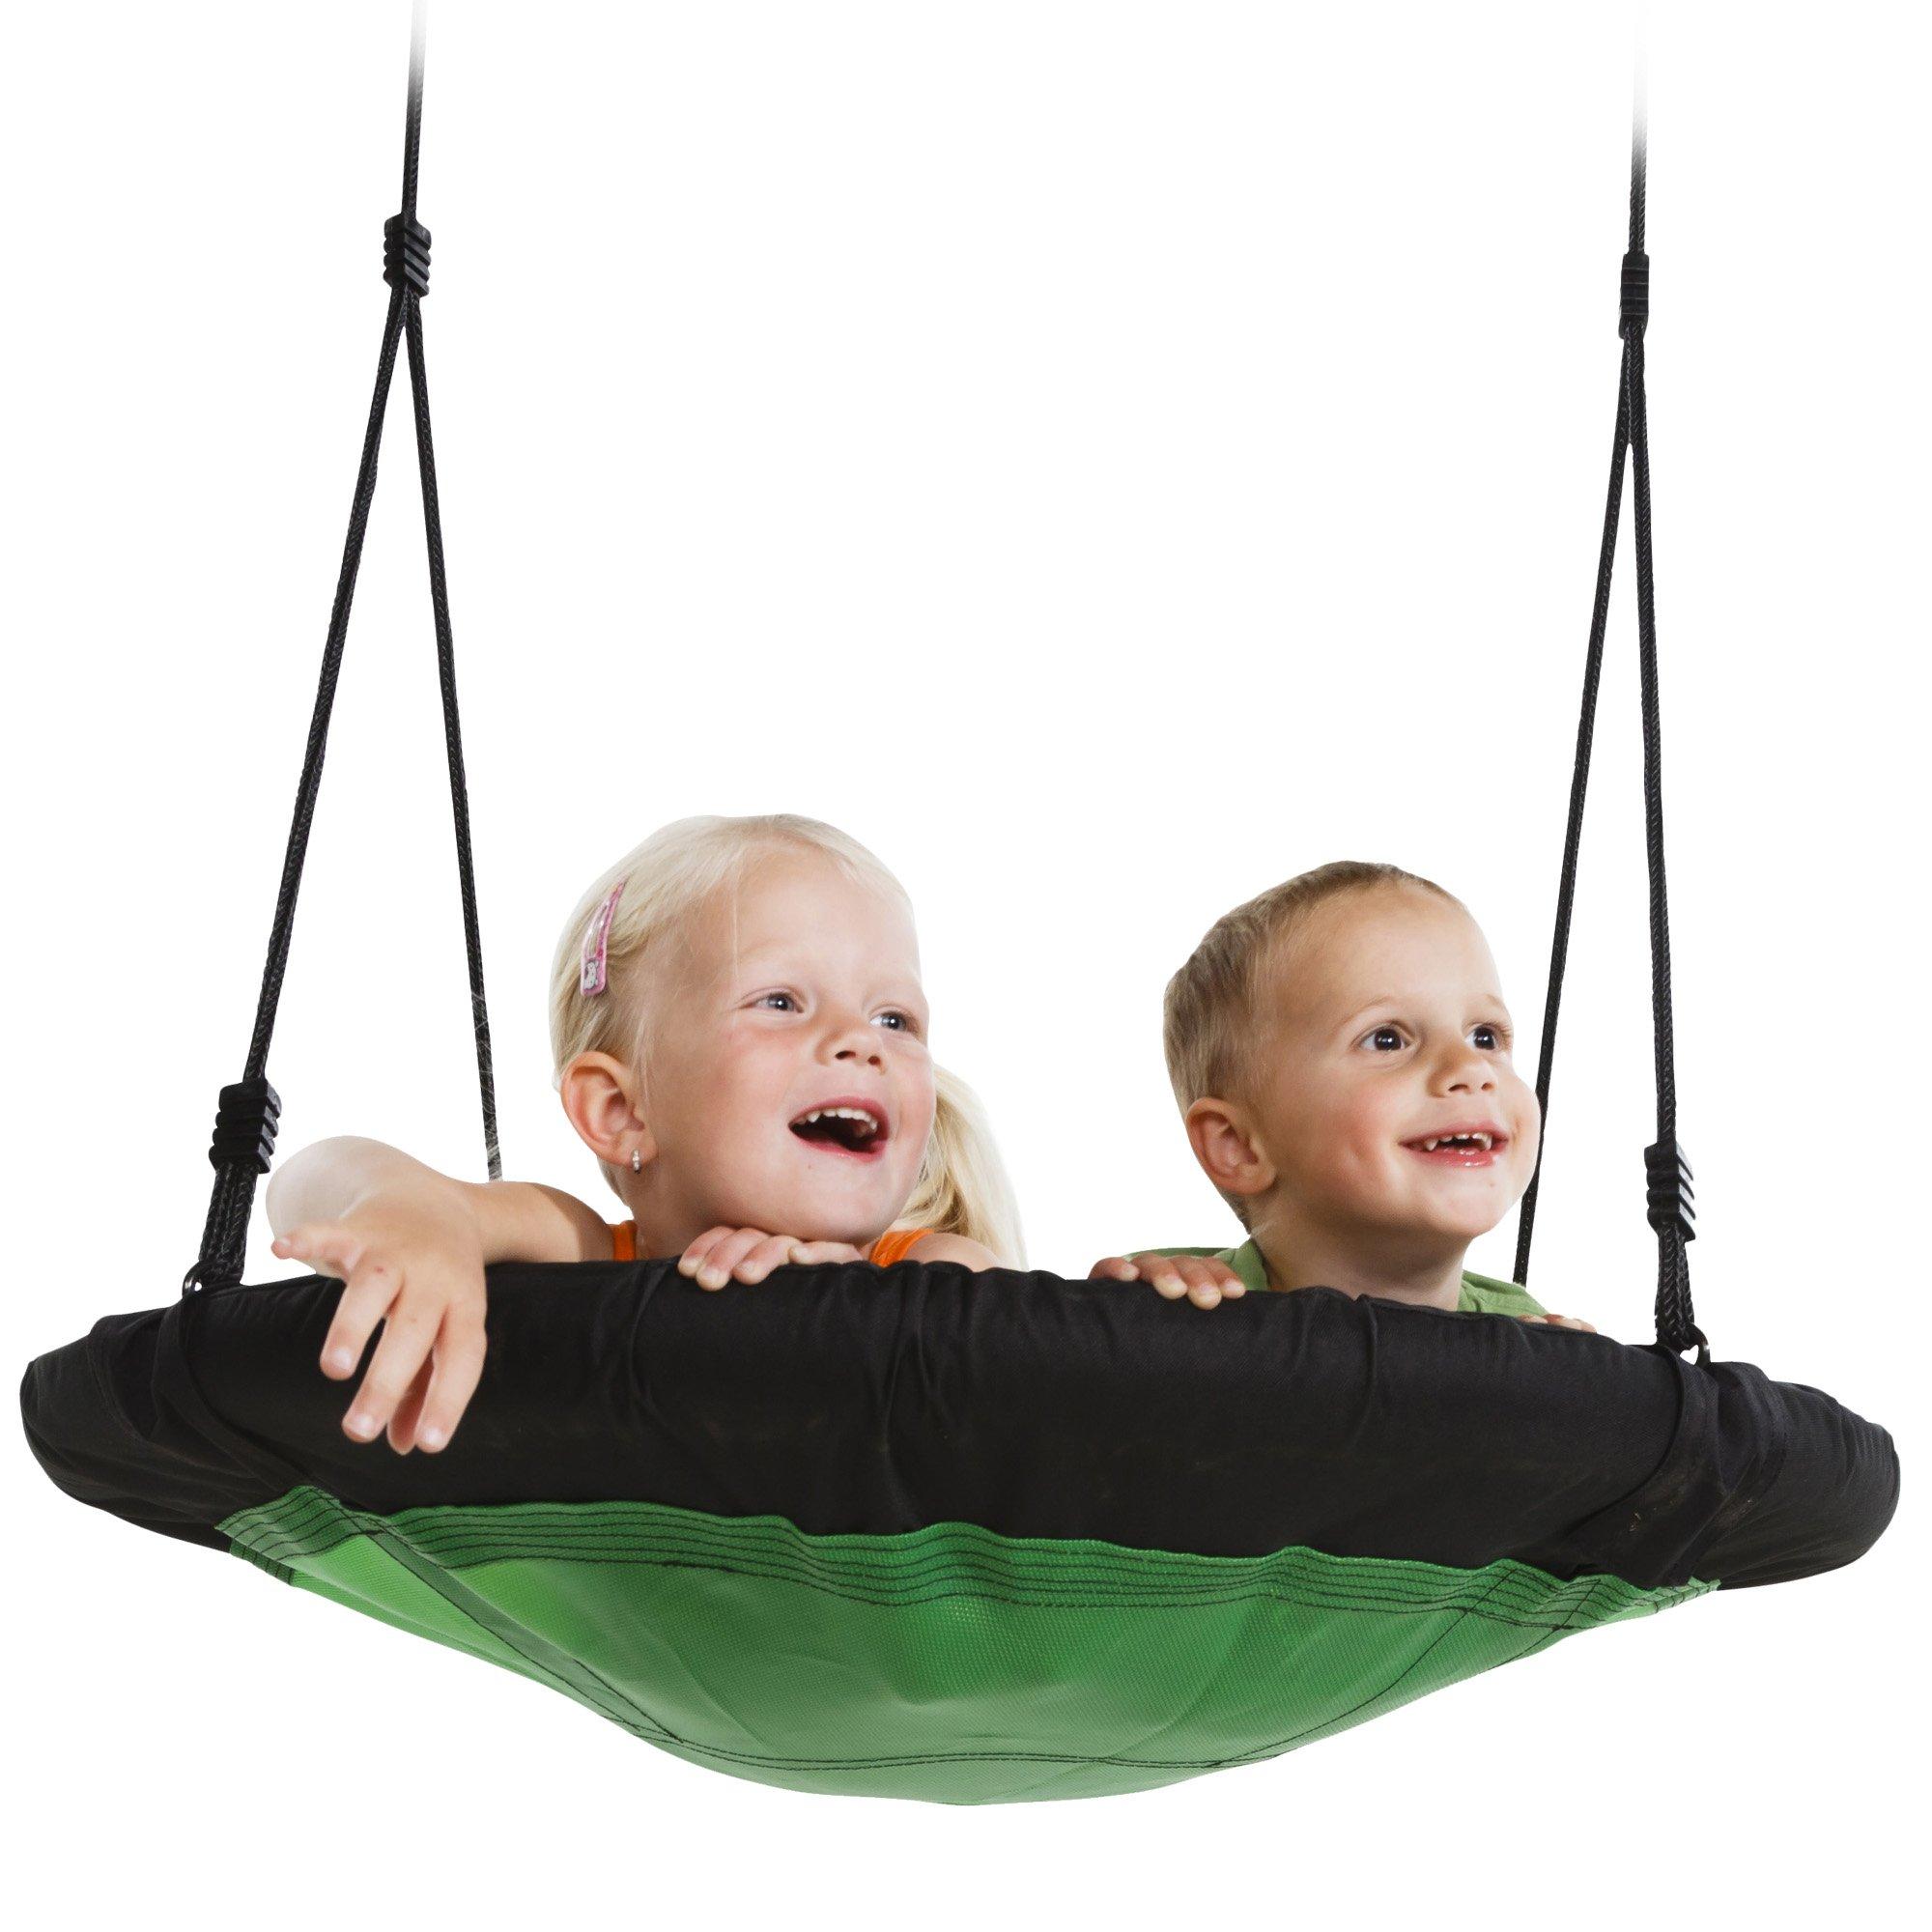 Swing-N-Slide NE 4630 Nest Swing Outdoor Swing with 40'' Diameter, Green & Black by Swing-N-Slide